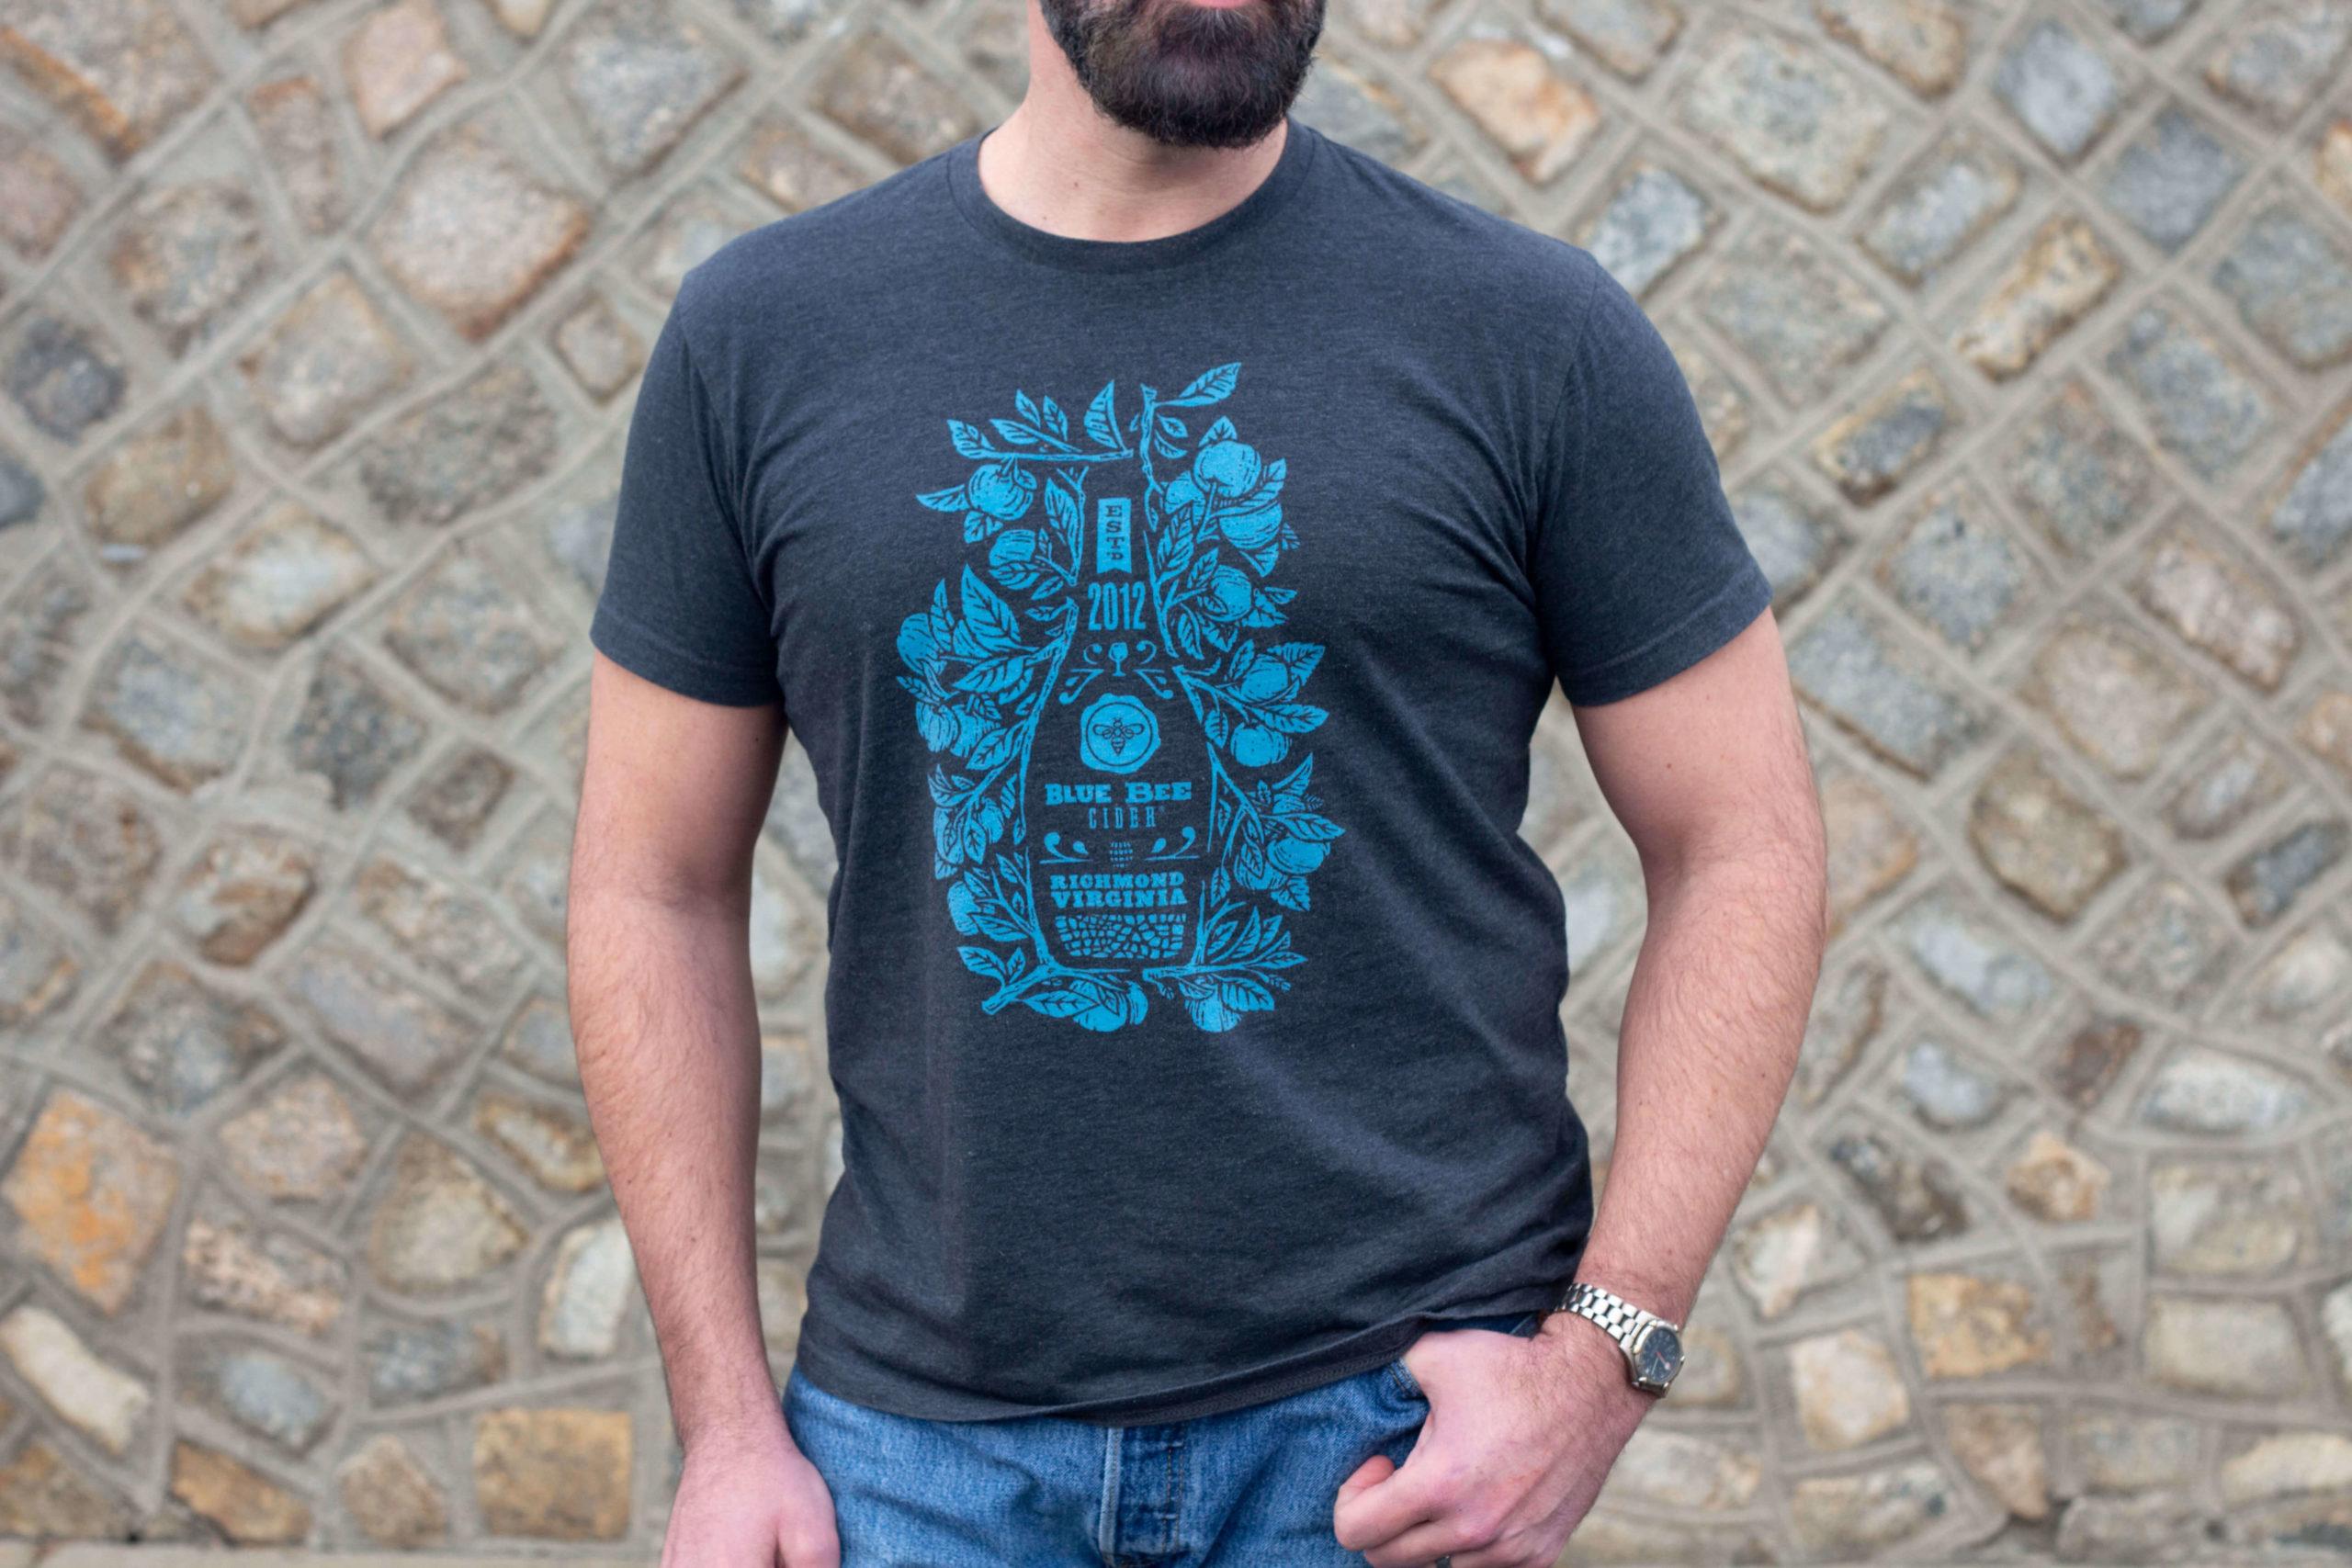 Blue Bee Cider Tshirt Design